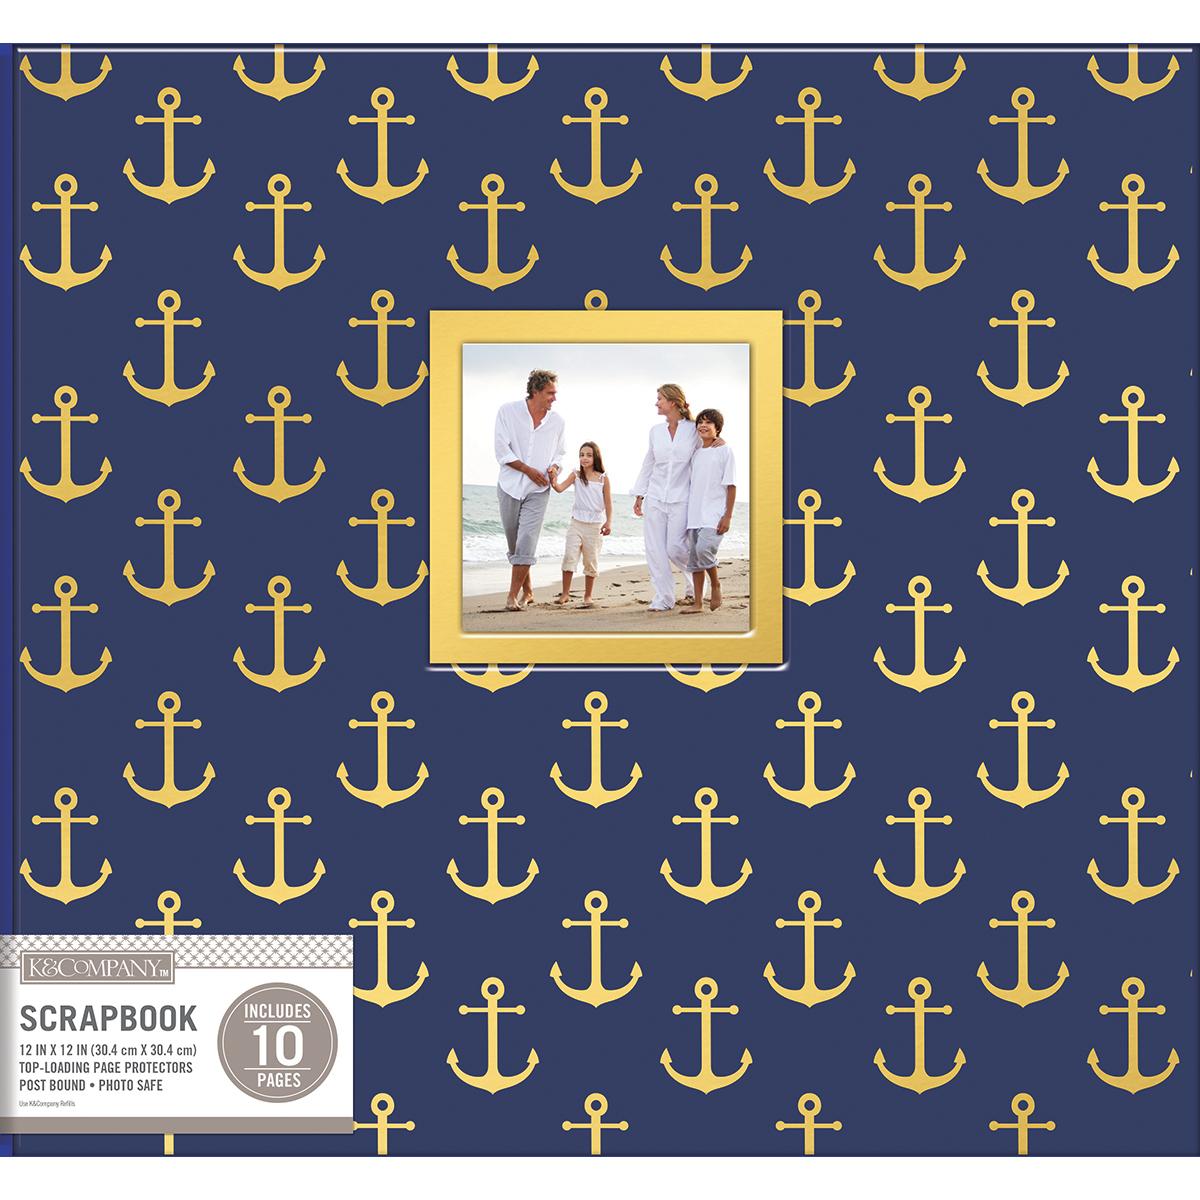 K&Company Post Bound Window Album 12X12-Nautical